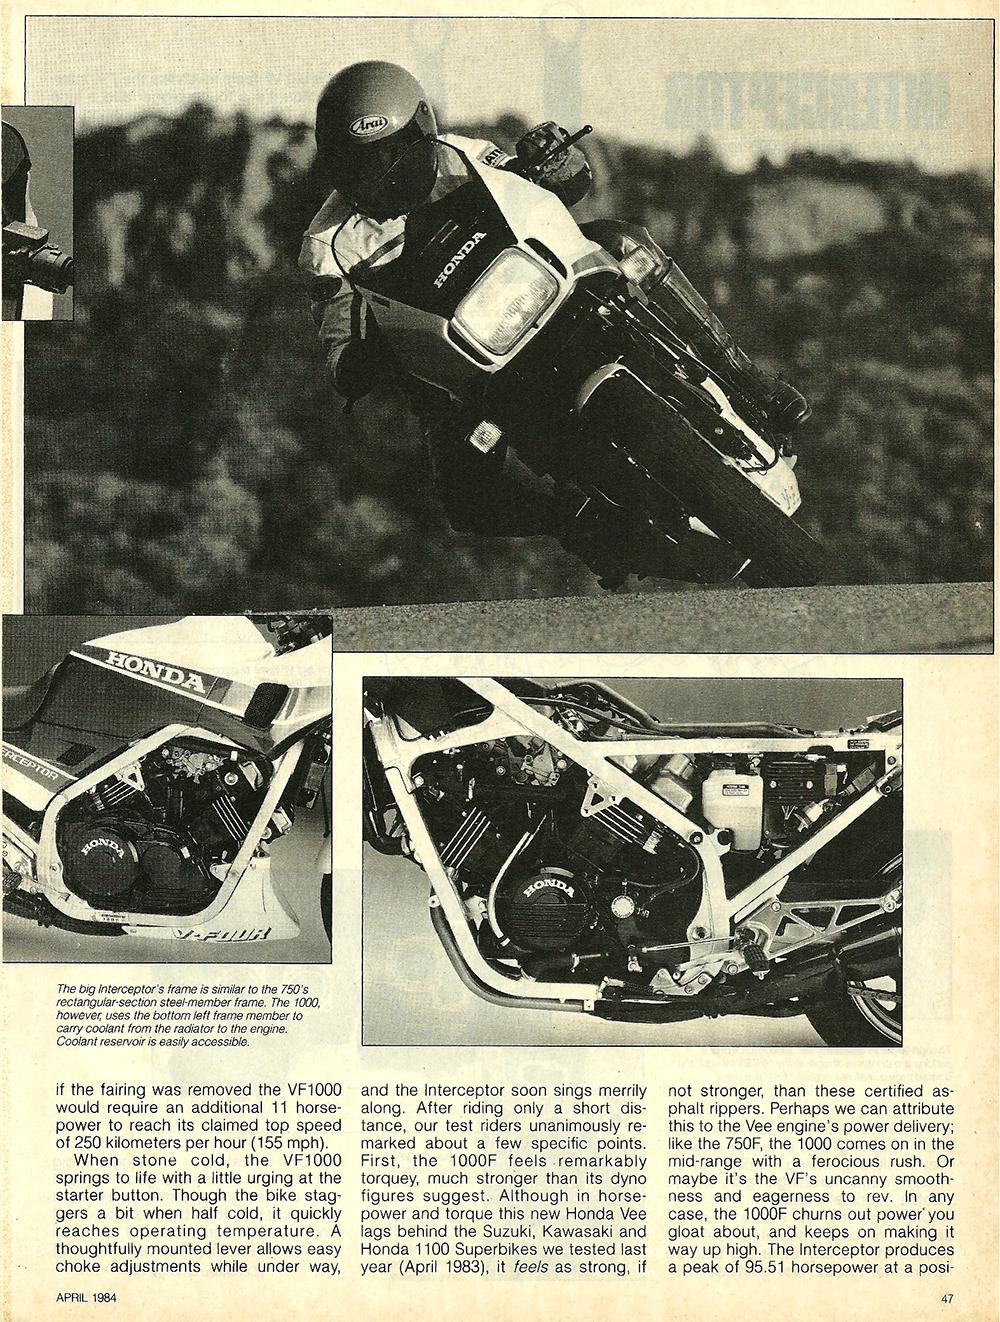 1984 Honda VF1000 Interceptor road test 6.jpg